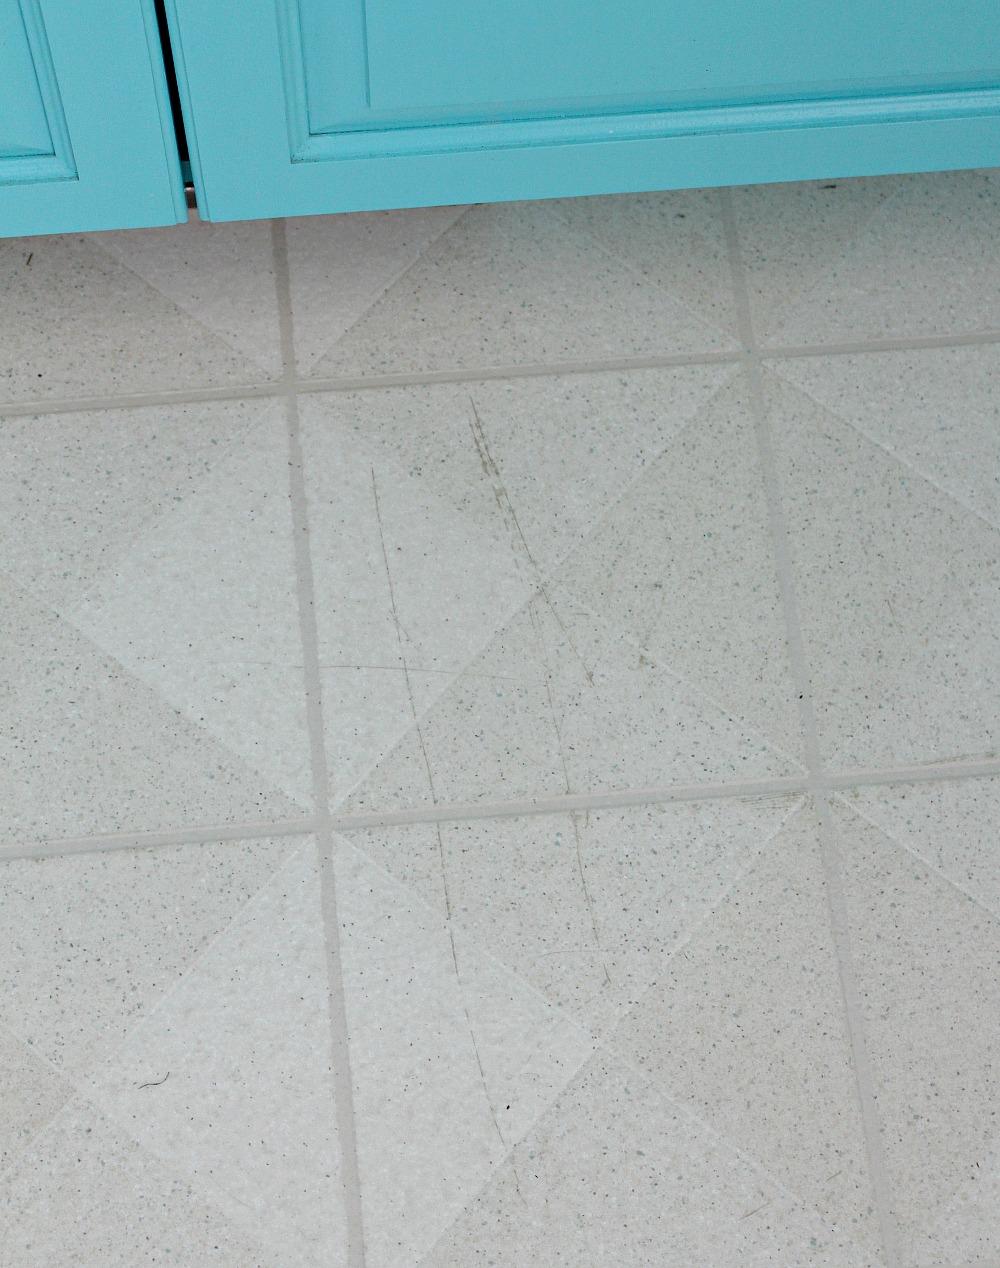 Painting a Vinyl Floor